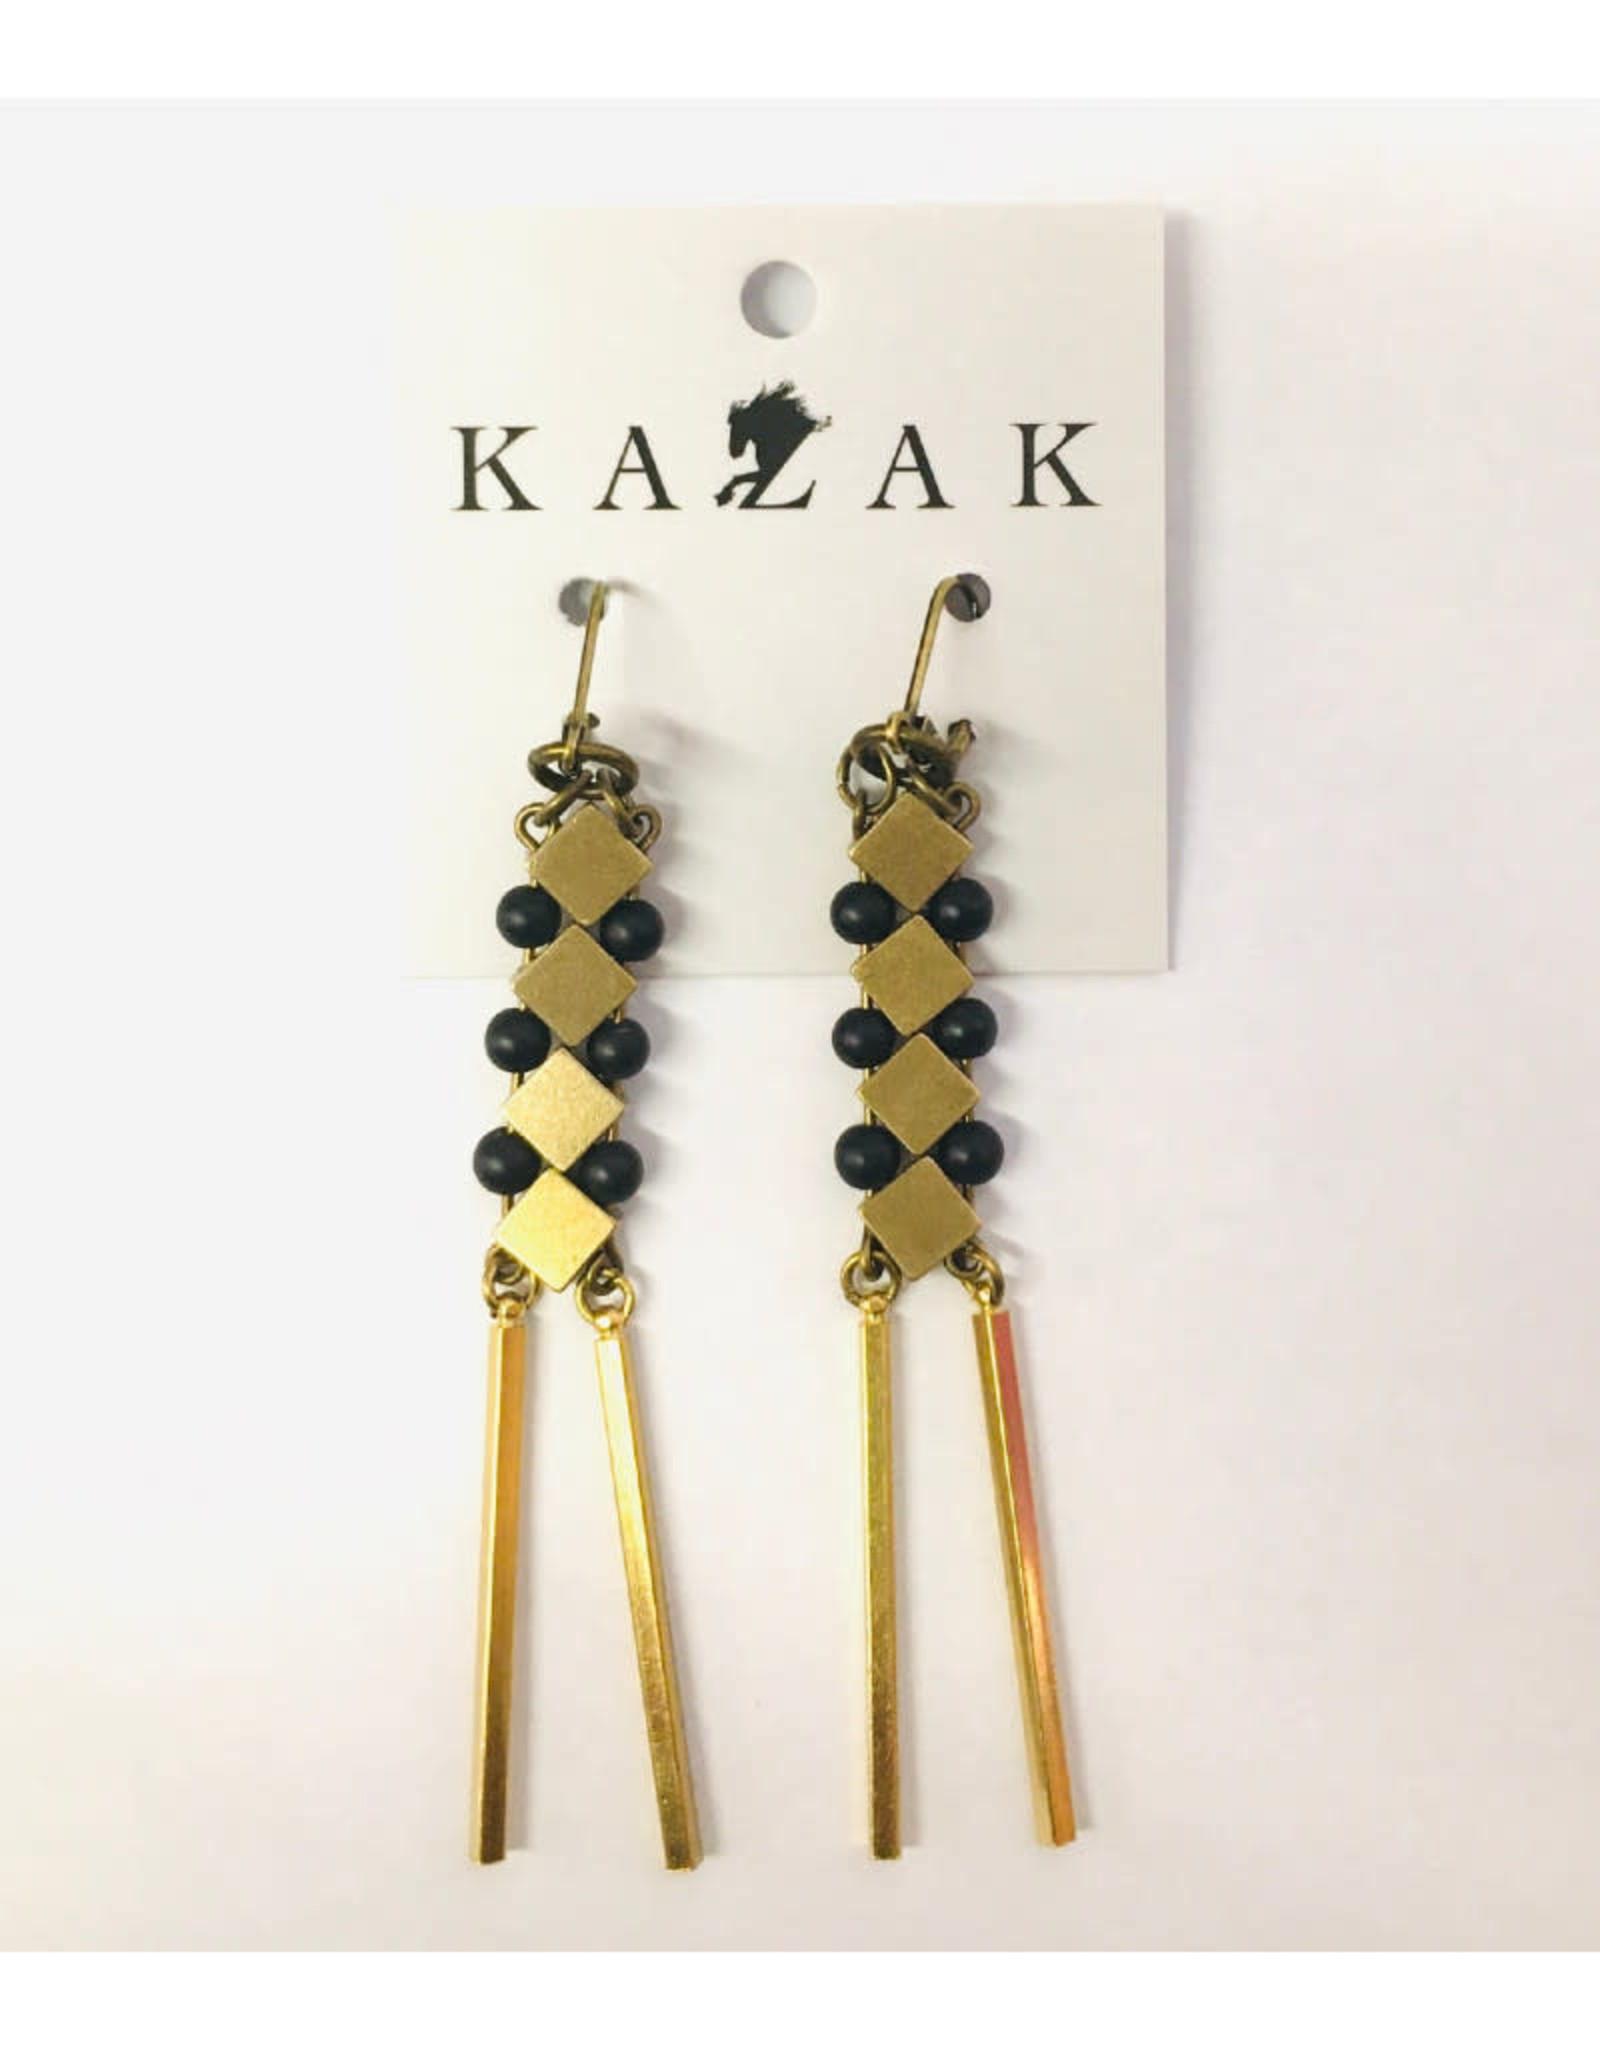 Kazak Boucles d'oreilles Inverness PE21 Kazak Noir